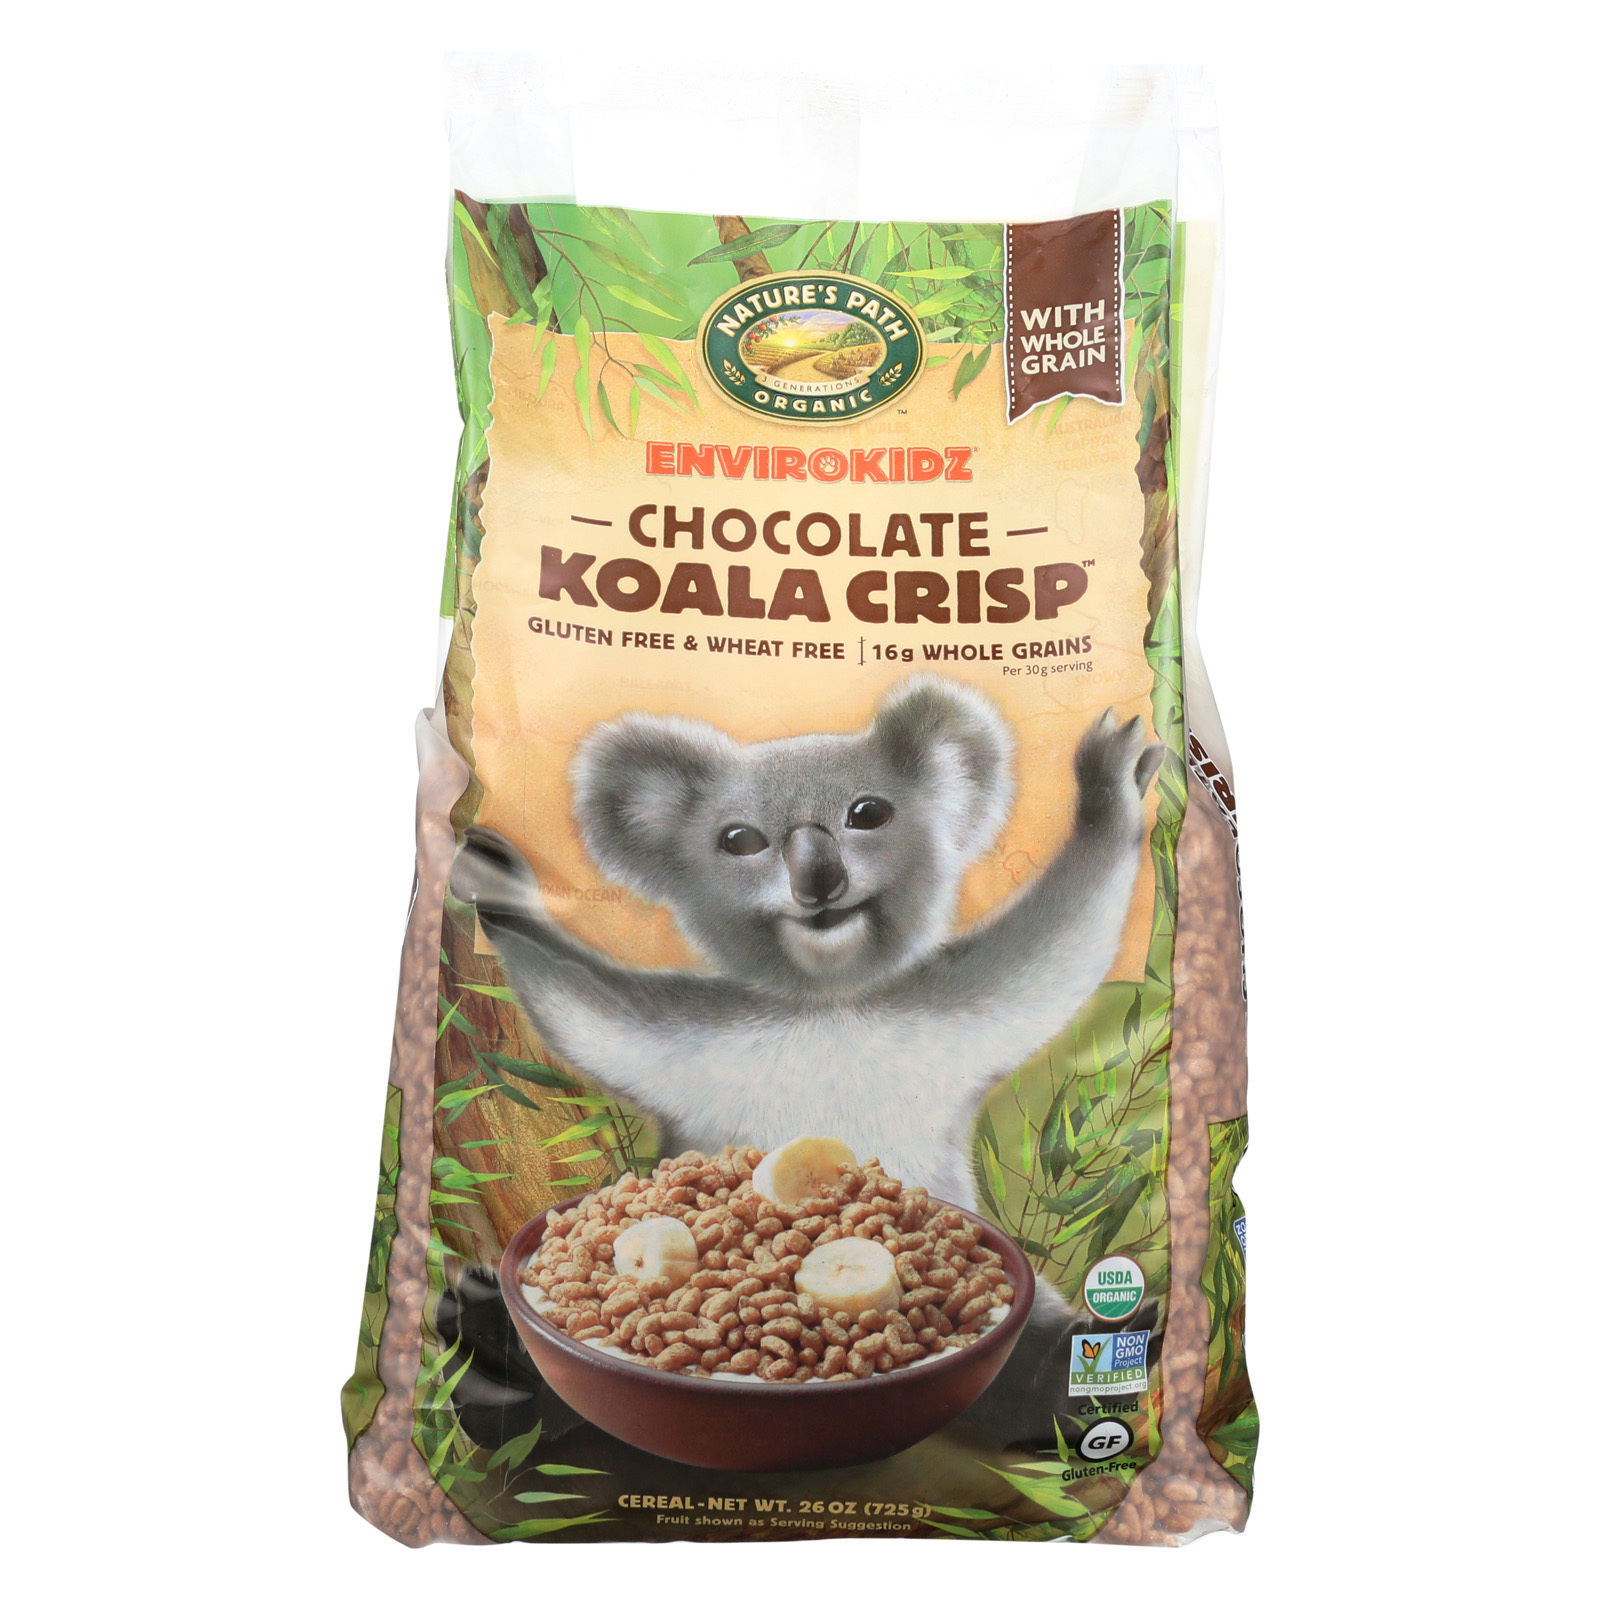 Envirokidz Organic Koala Crisp - Chocolate Cereal - Case of 6 - 25.6 oz.